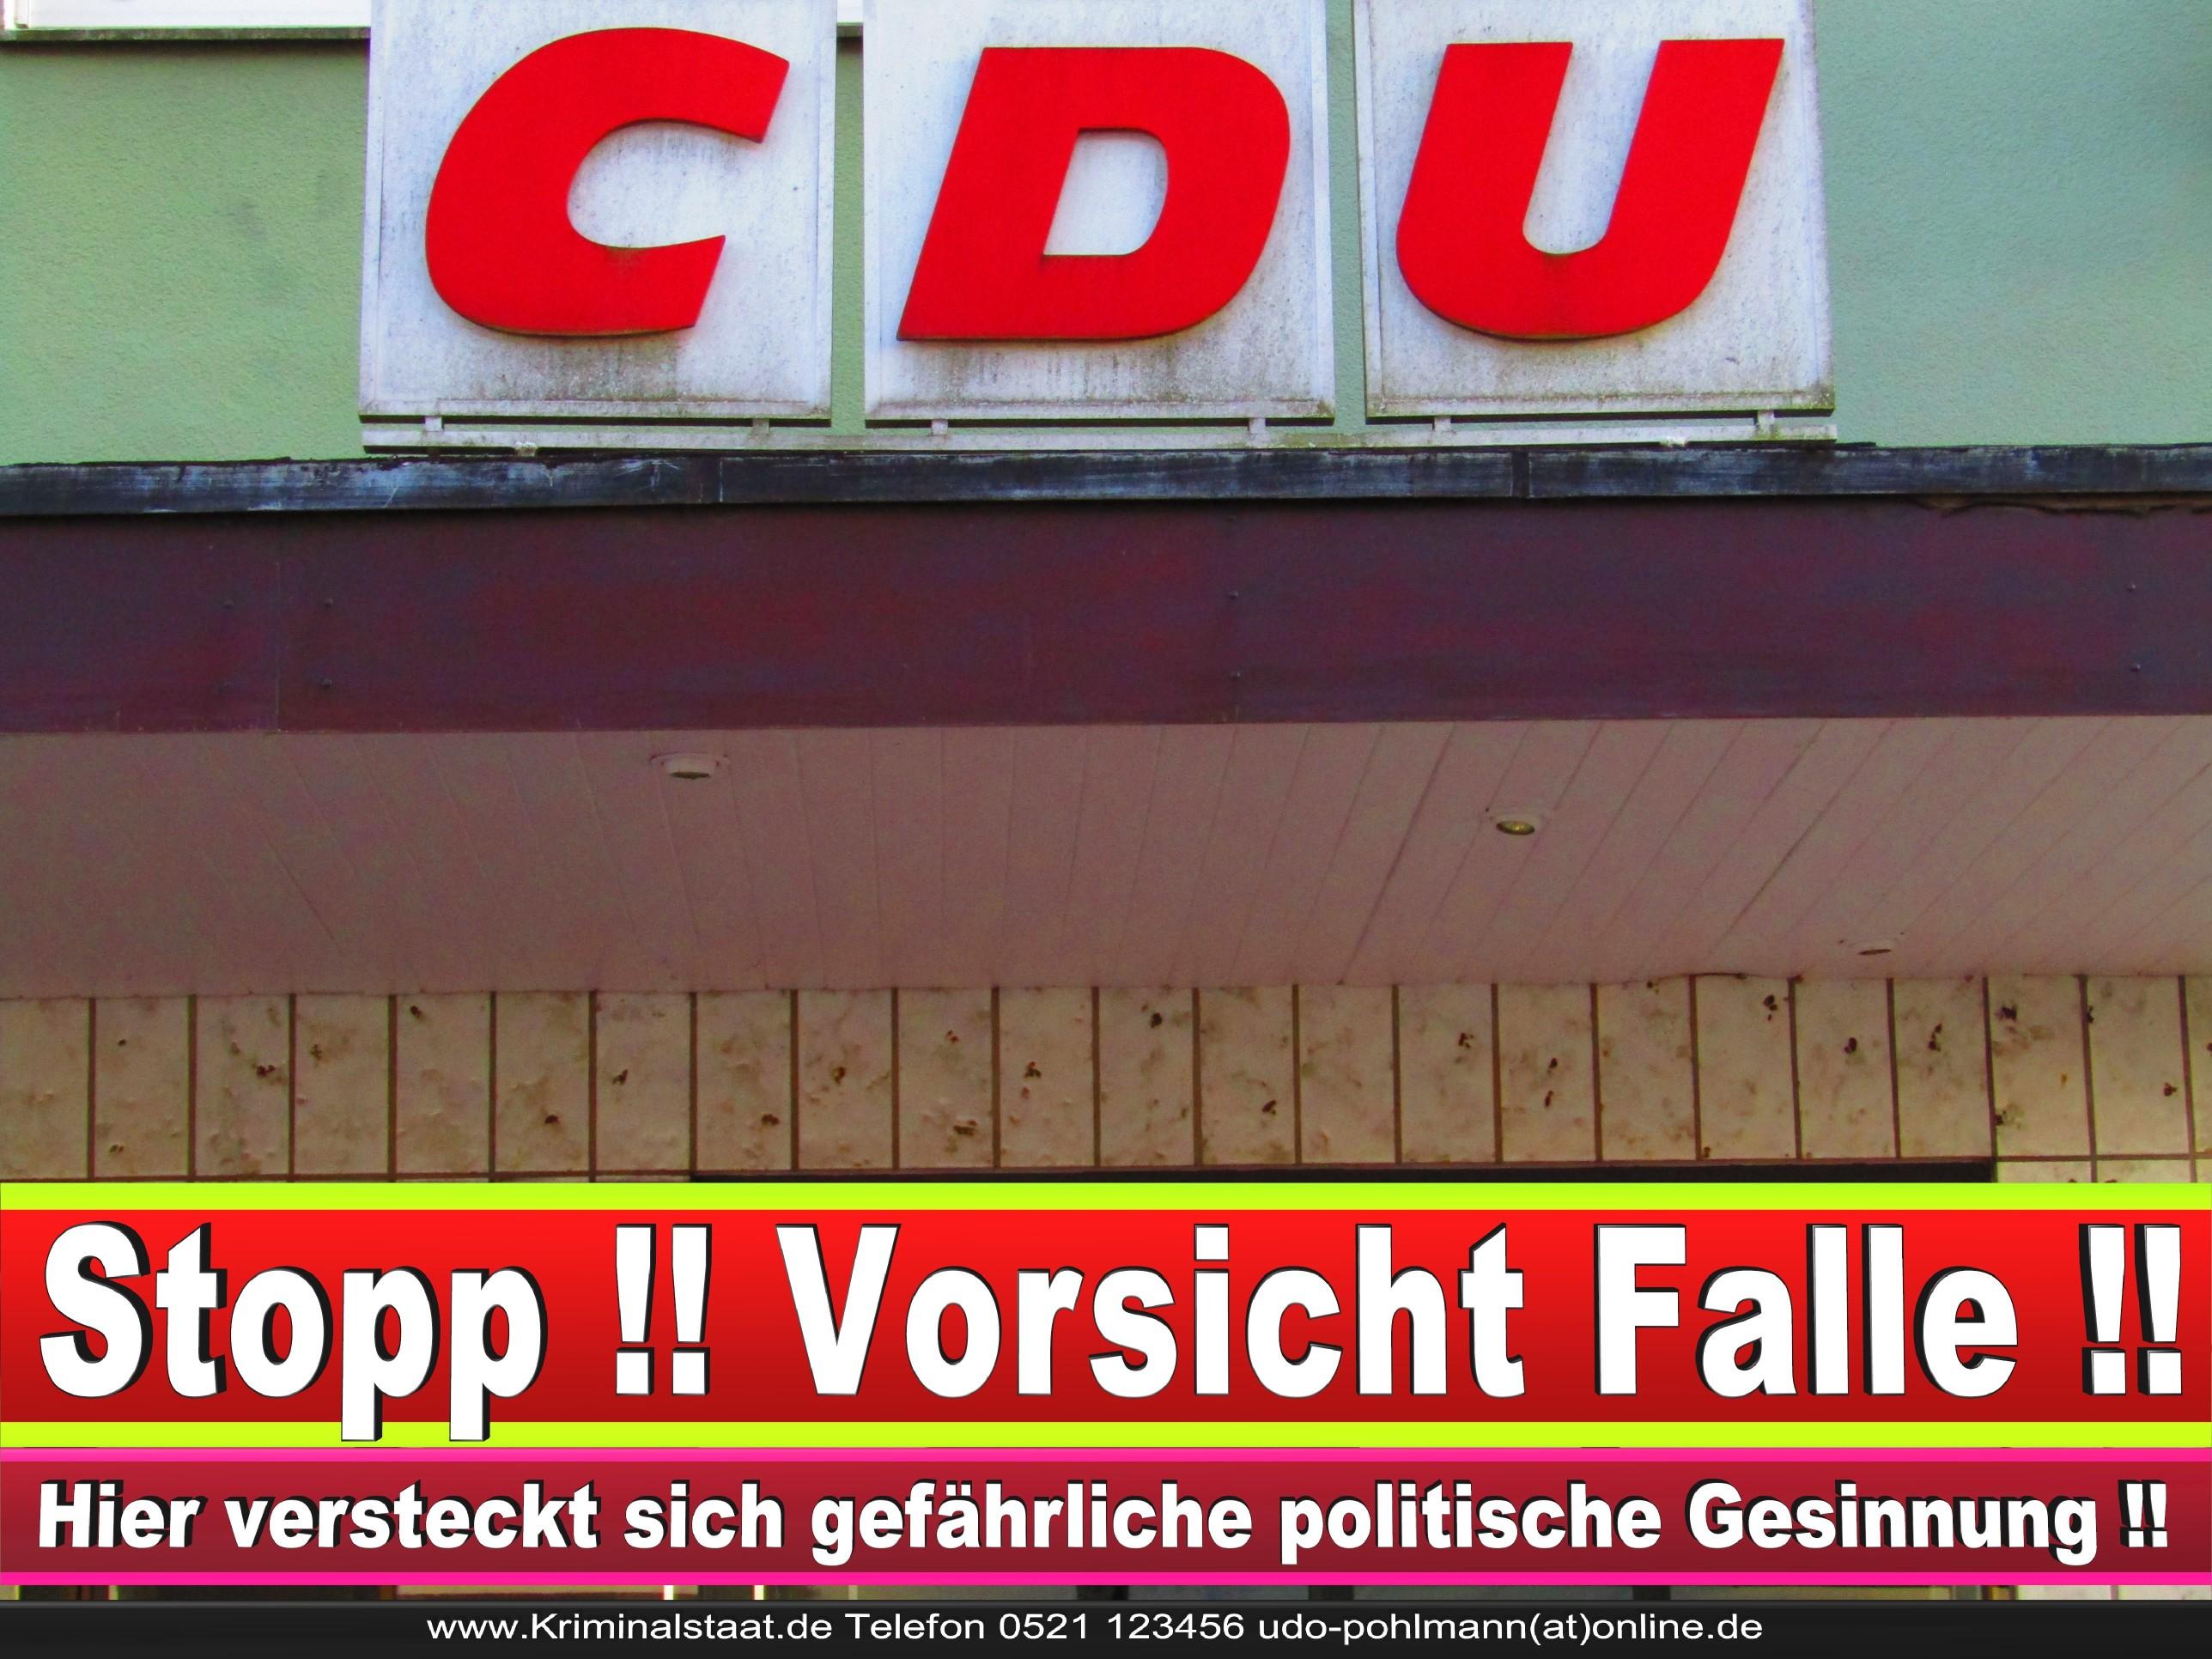 Rathaus Steinhagen CDU SPD FDP Ortsverband CDU Bürgerbüro CDU SPD Korruption Polizei Bürgermeister Karte Telefonbuch NRW OWL (6)